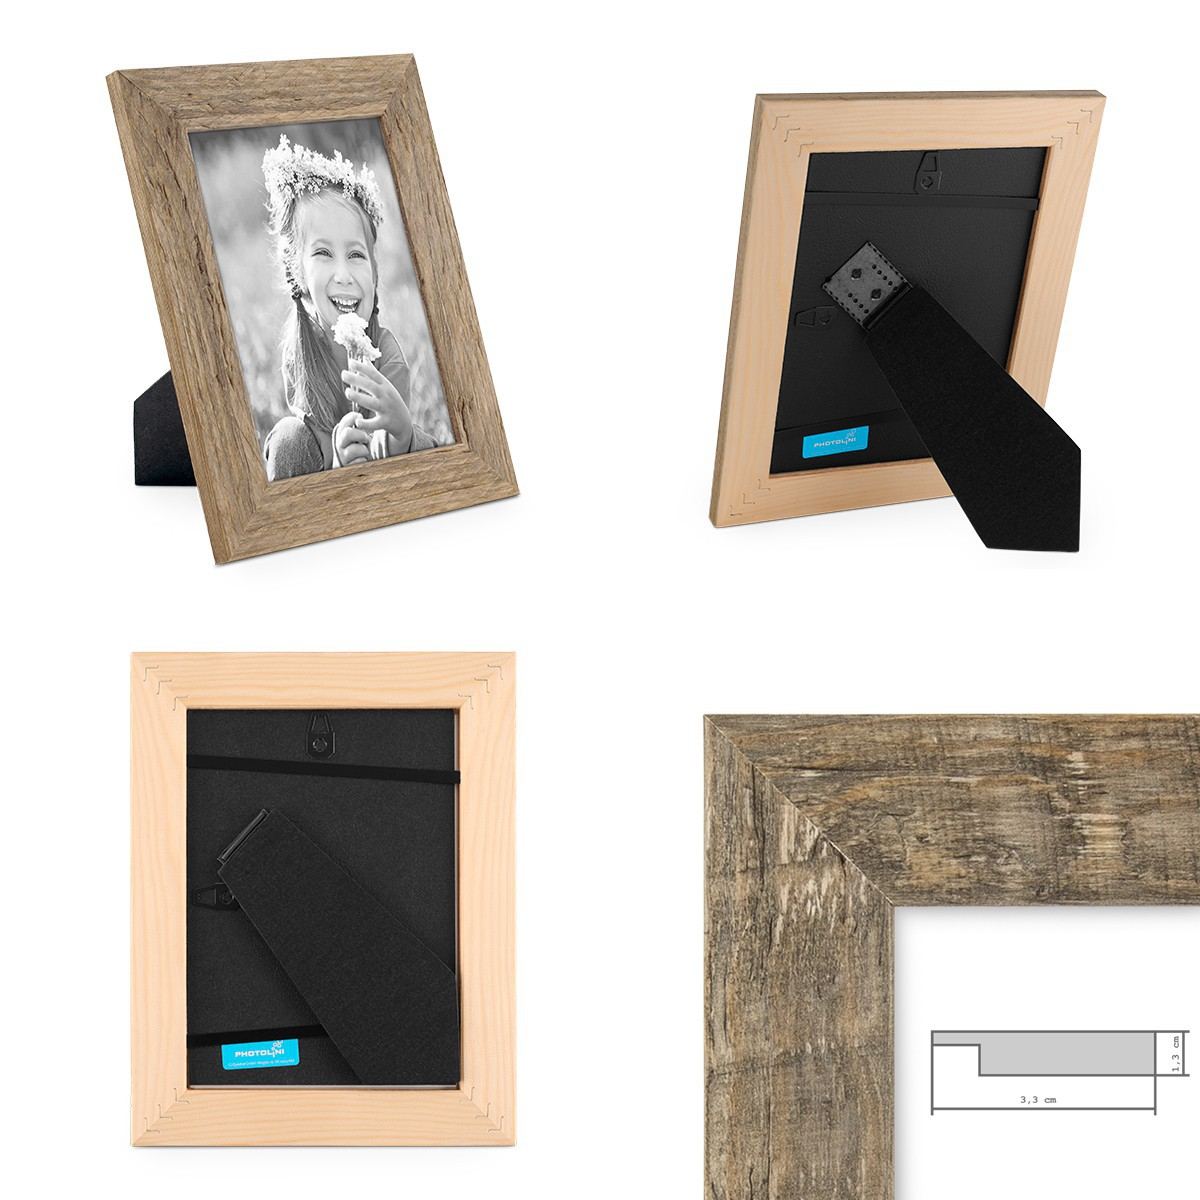 2er bilderrahmen set strandhaus holz rustikal eiche braun weiss grau foto rahmen ebay. Black Bedroom Furniture Sets. Home Design Ideas